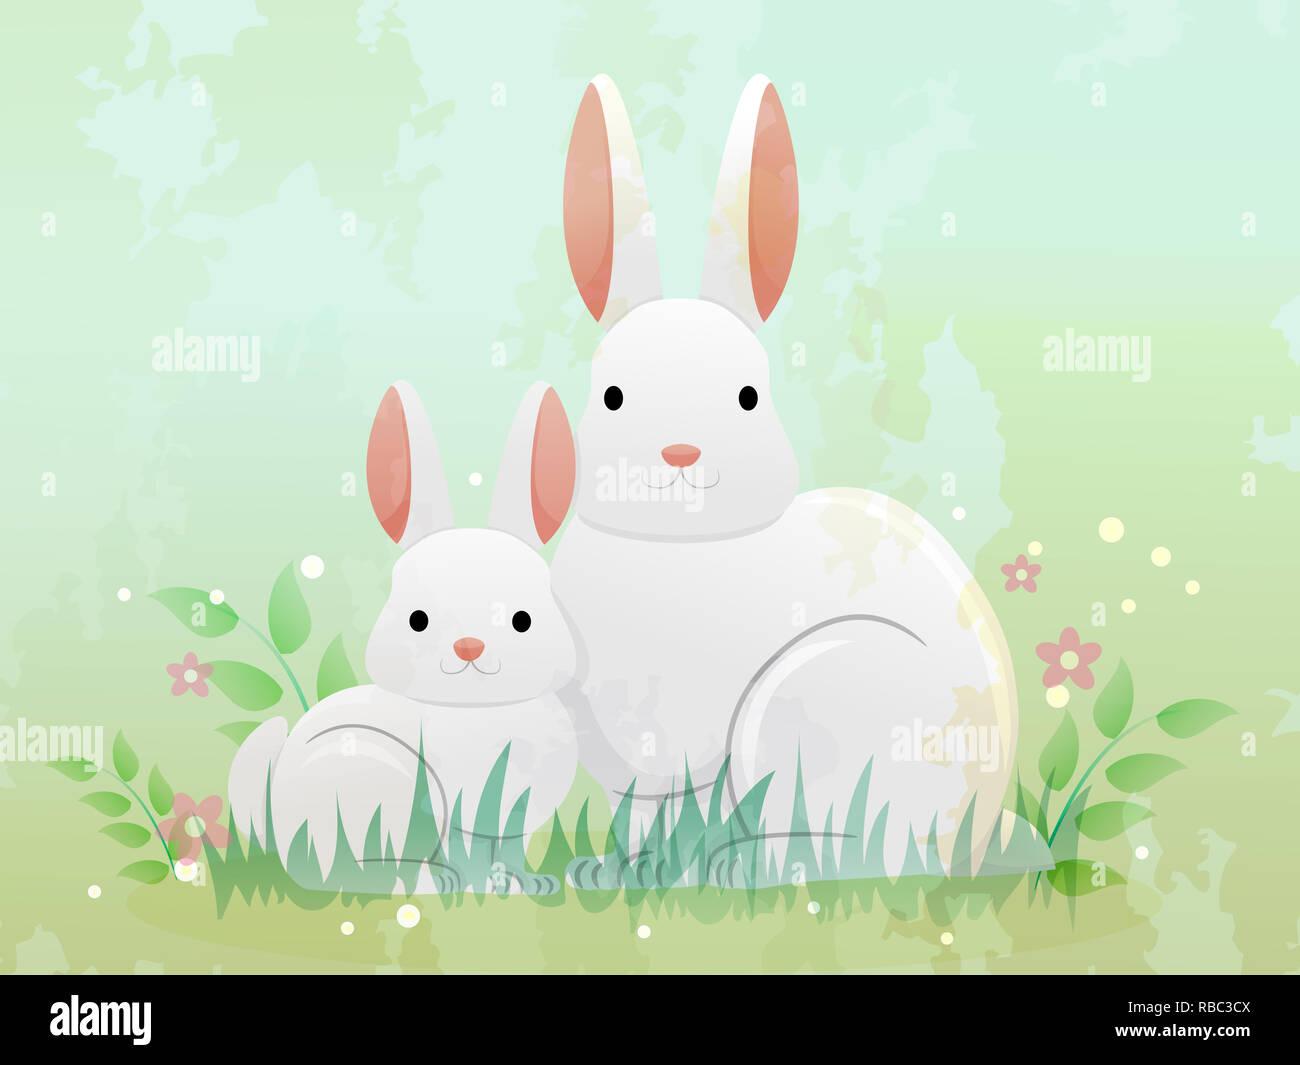 Rabbit Clipart Free Rabbit Clip Art Images Clipart - White Rabbit - Png  Download - Full Size Clipart (#31208) - PinClipart